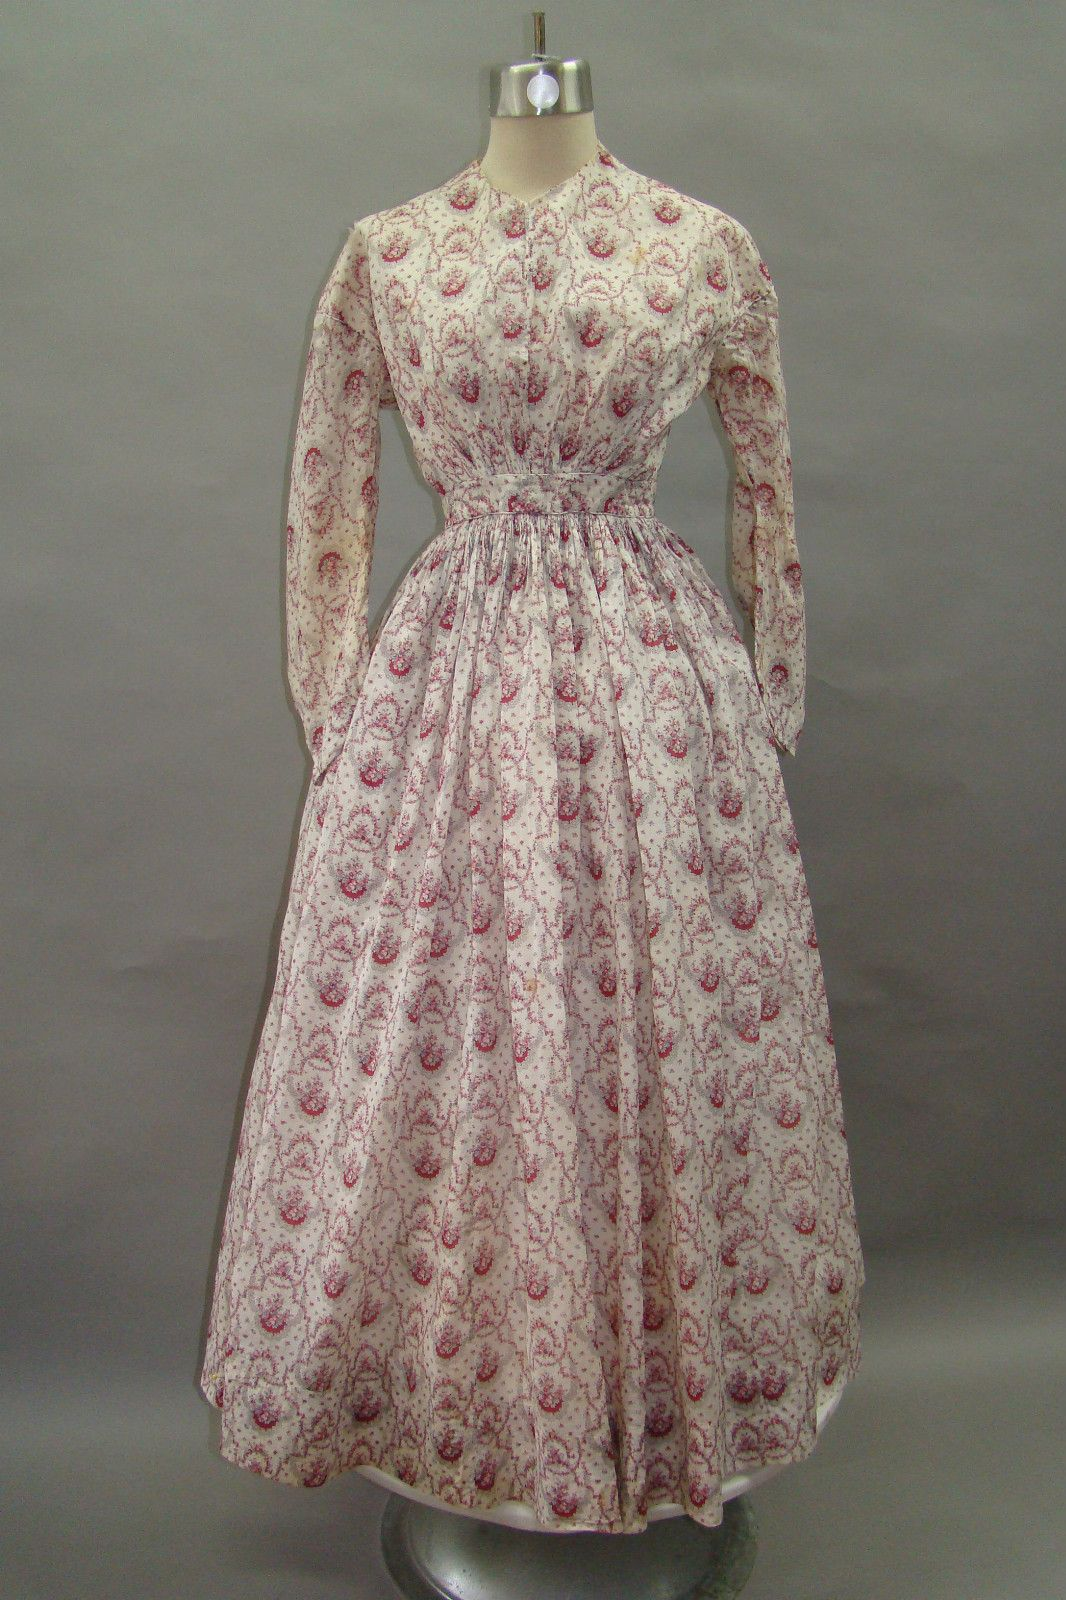 Darling 1860 S Work Day Dress Summer Sheer Dresses Fashion Day Dresses [ 1600 x 1066 Pixel ]